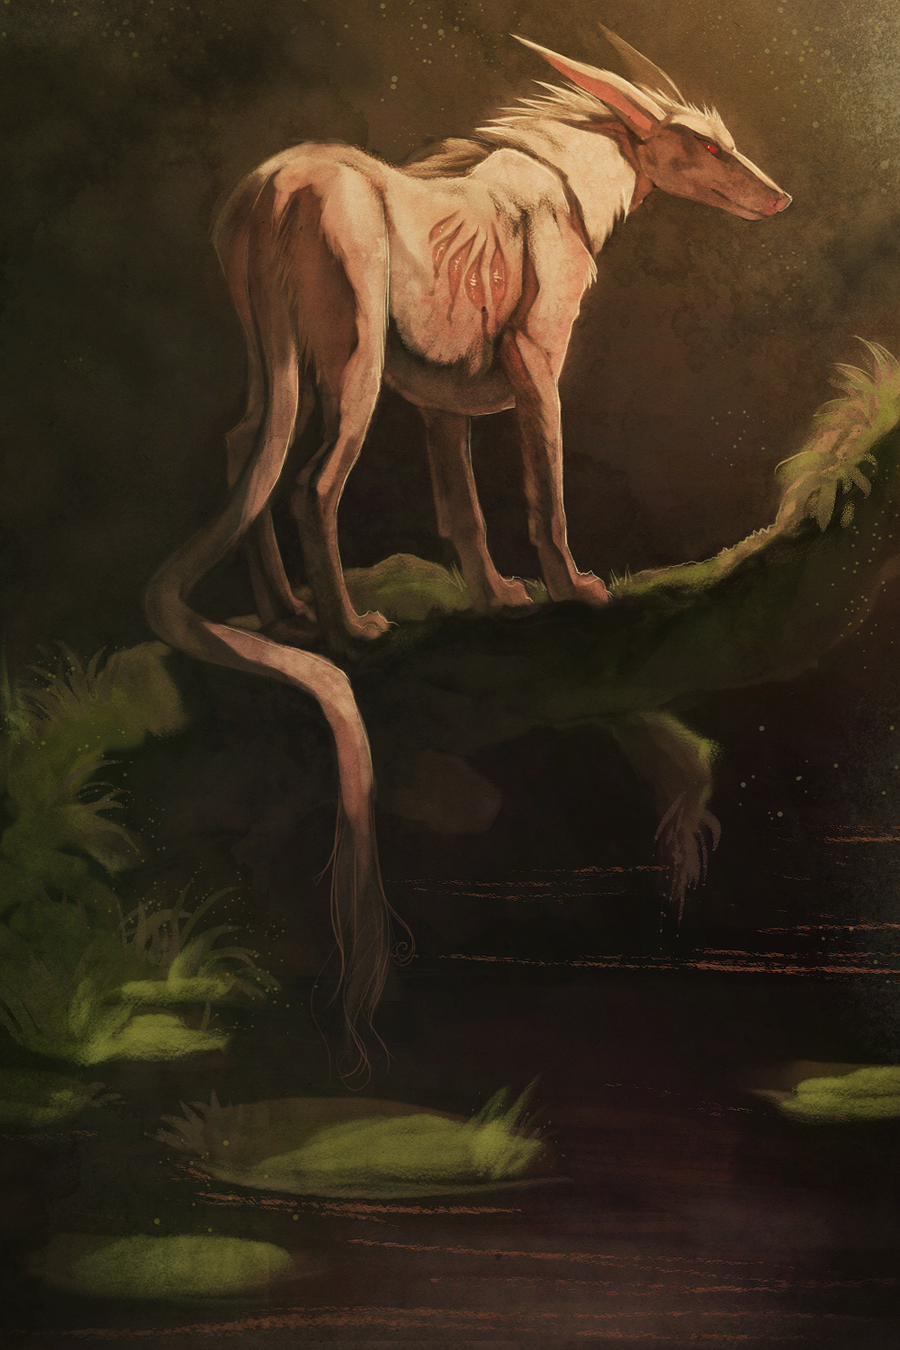 Lumen by CoyoteMange